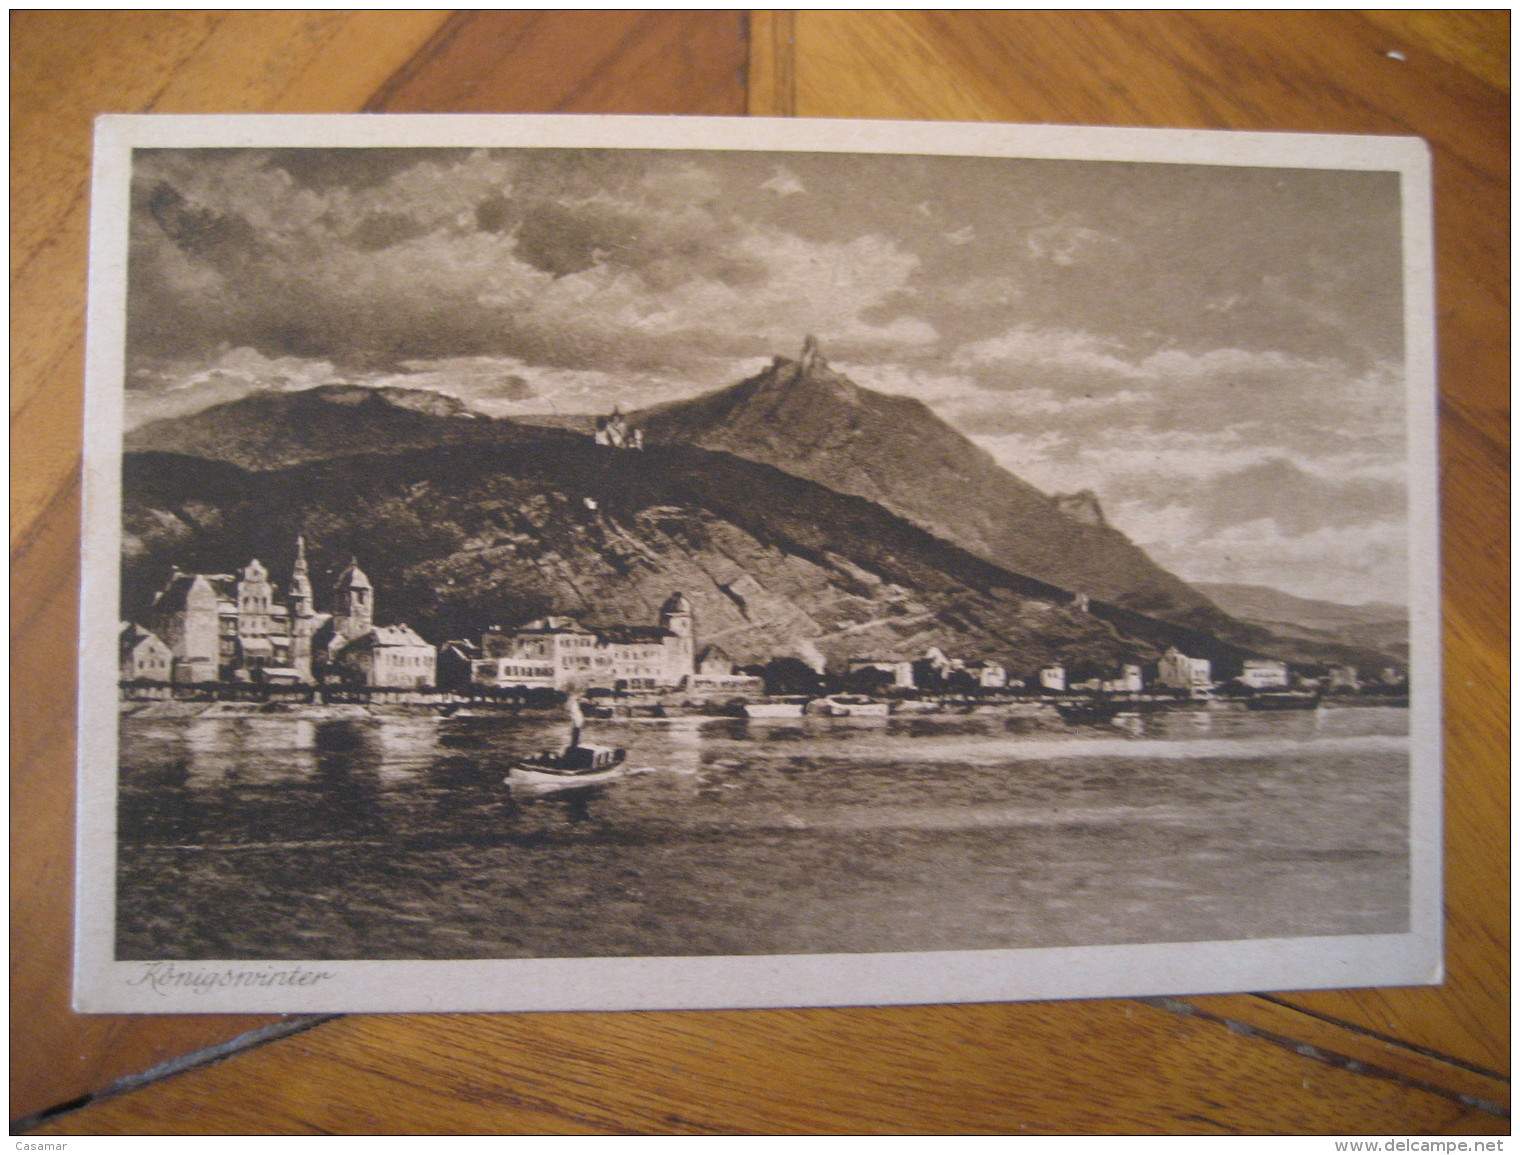 KONIGSWINTER Post Card North Rhine Westphalia Koln Rhein Sieg Kries Germany - Koenigswinter